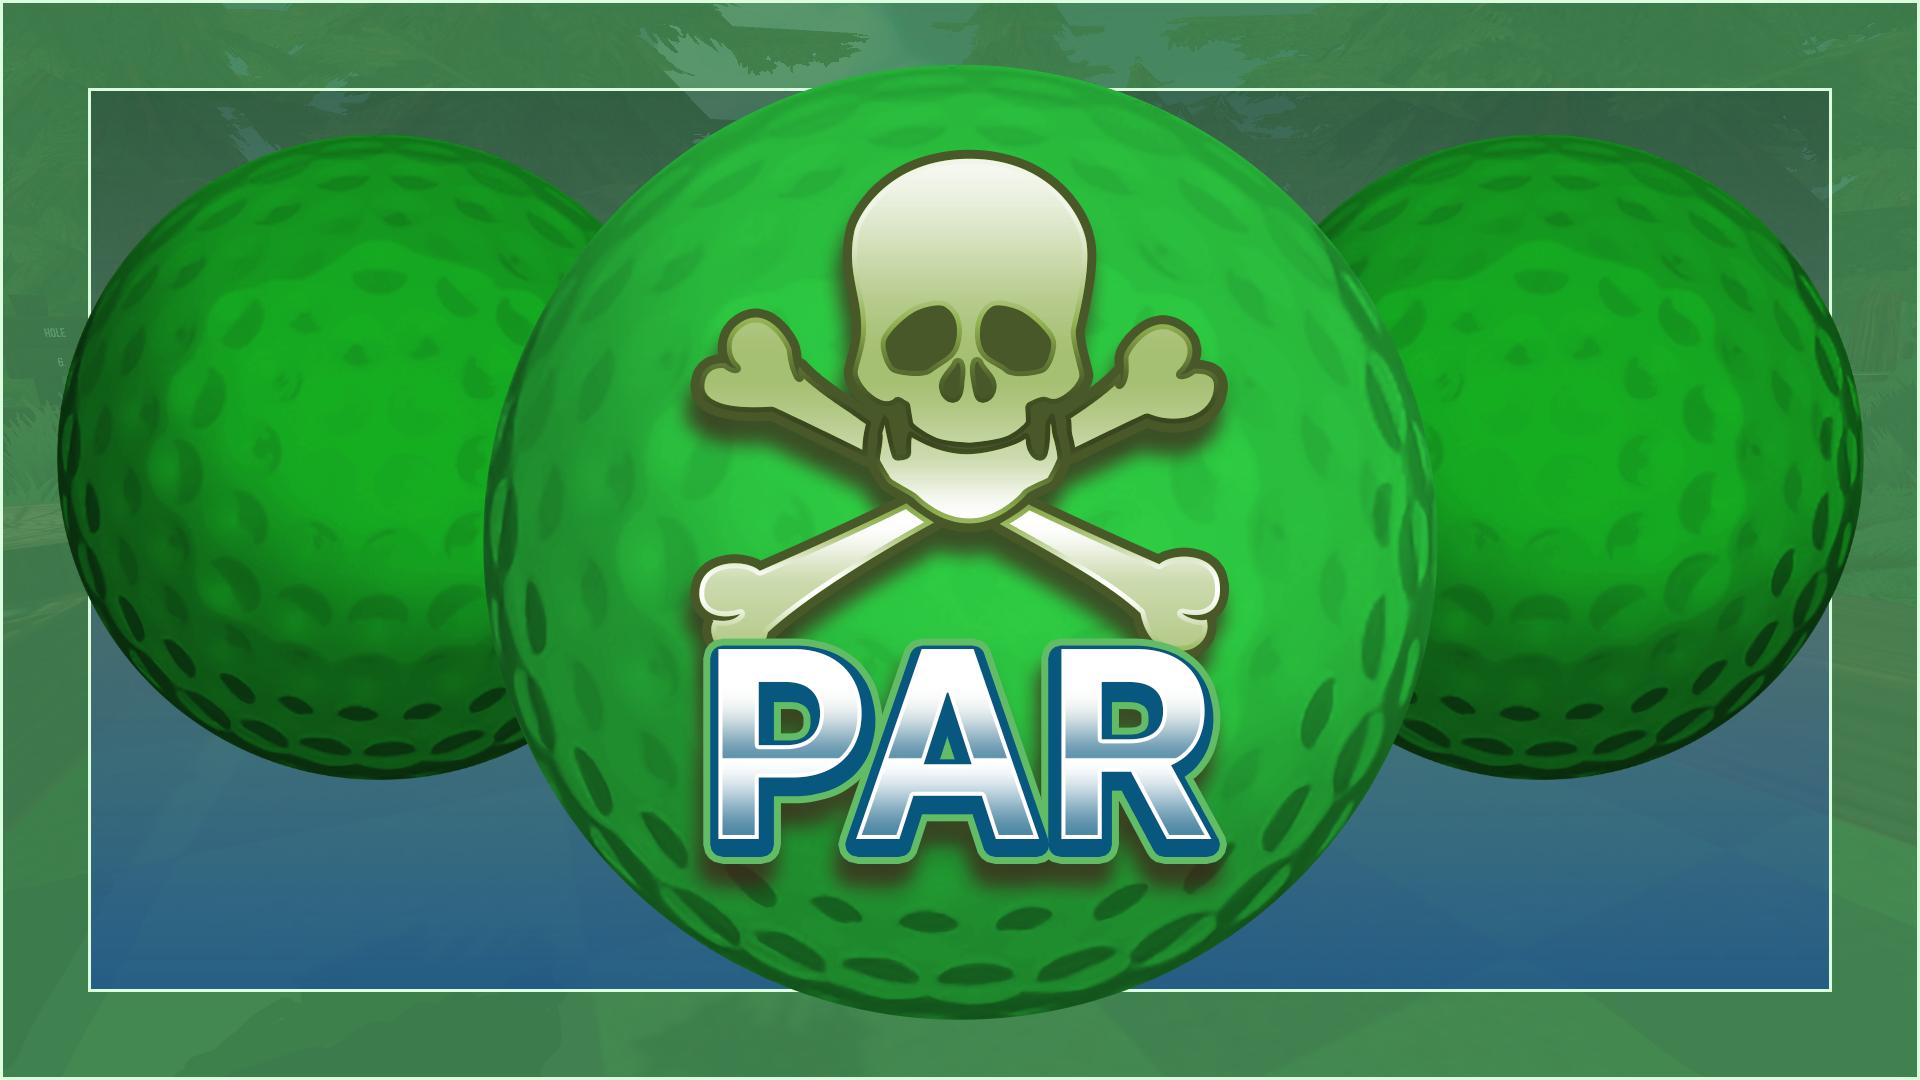 Paaarrrrrrr!